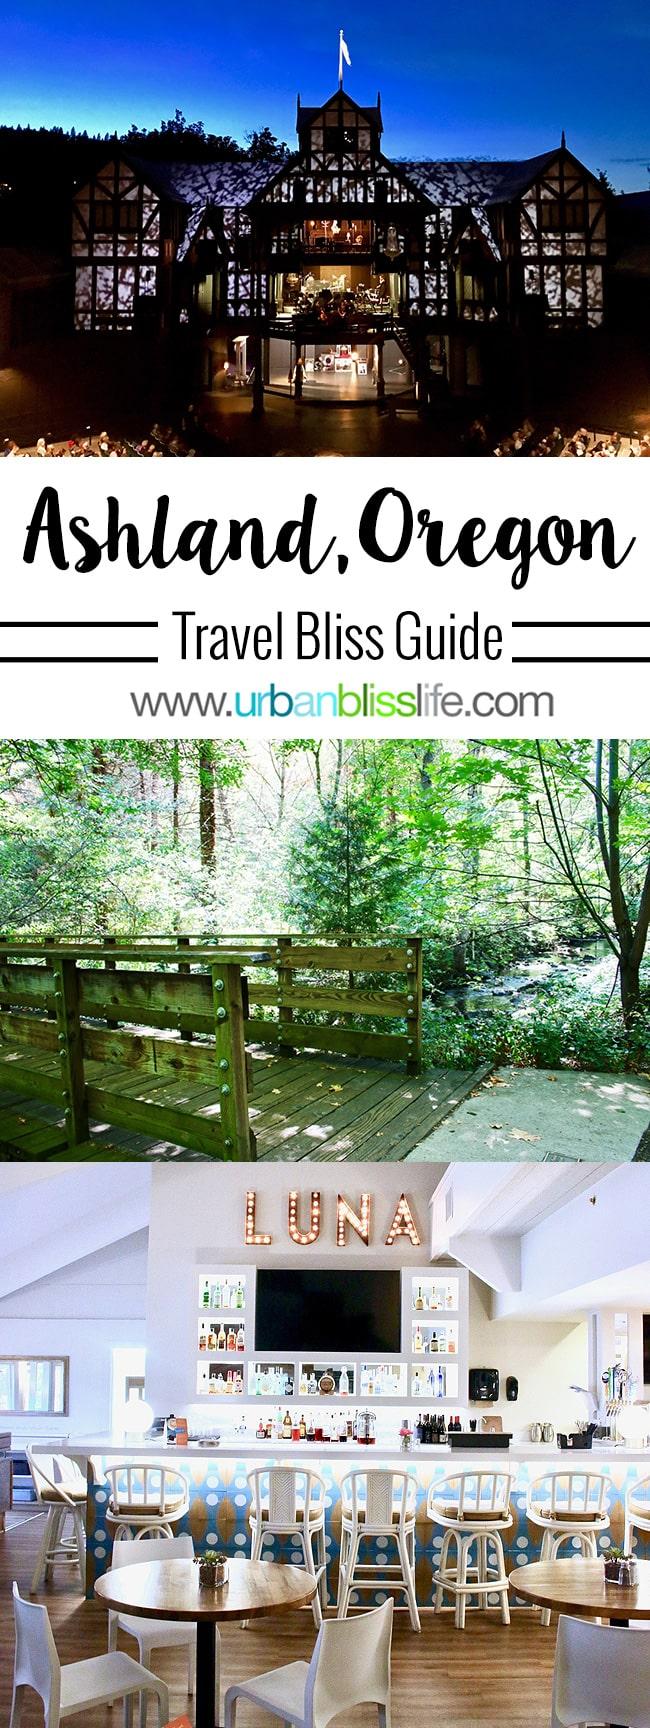 Ashland Oregon Travel Guide - on UrbanBlissLife.com